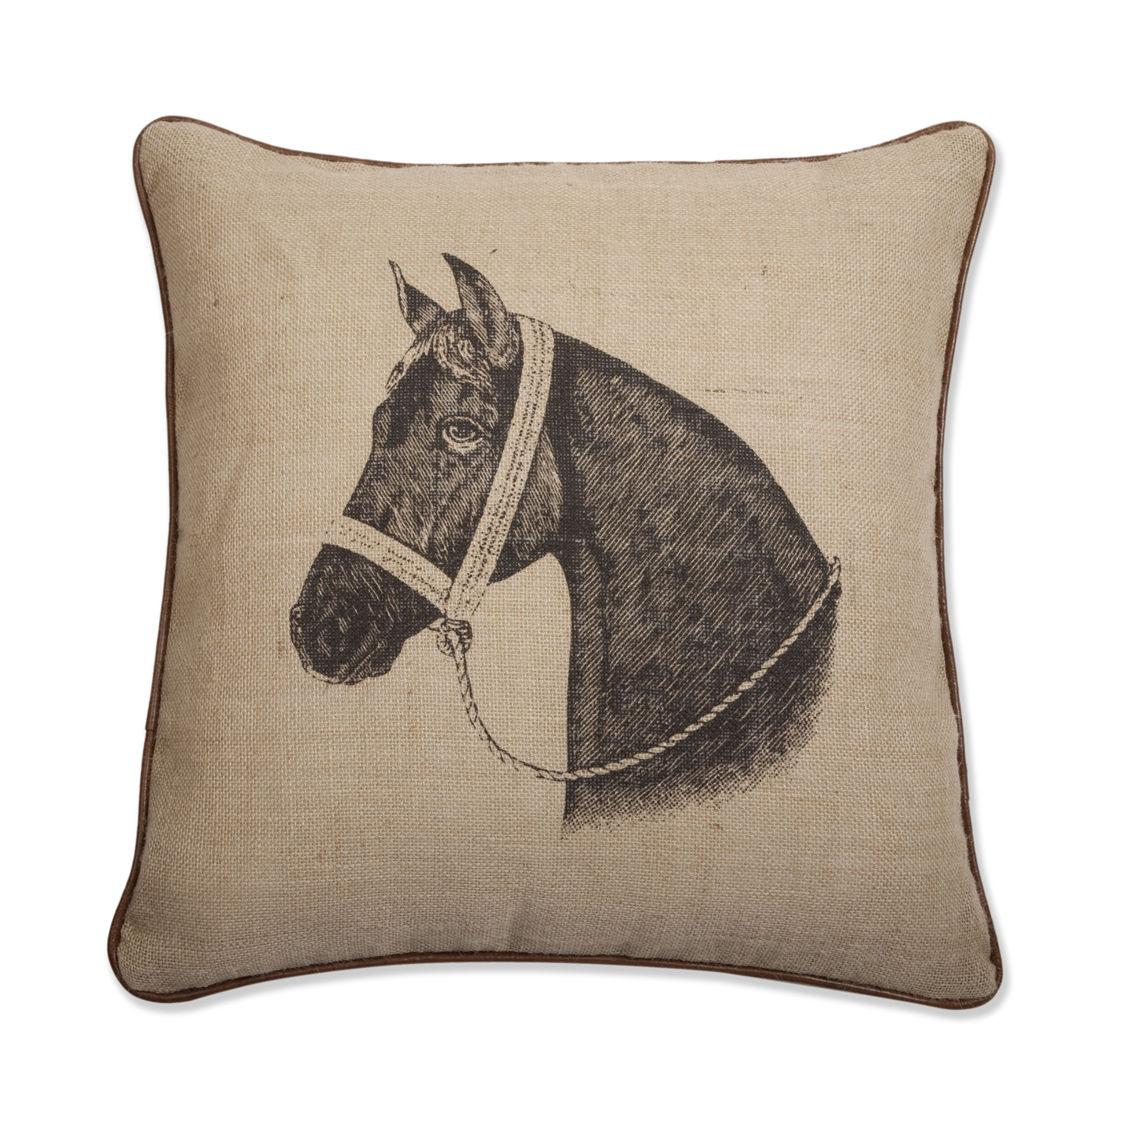 Decorative Horse Pillows : Top 28+ - Horses Pillow - horse pillows decorative throw pillows zazzle, horse pillows horse ...